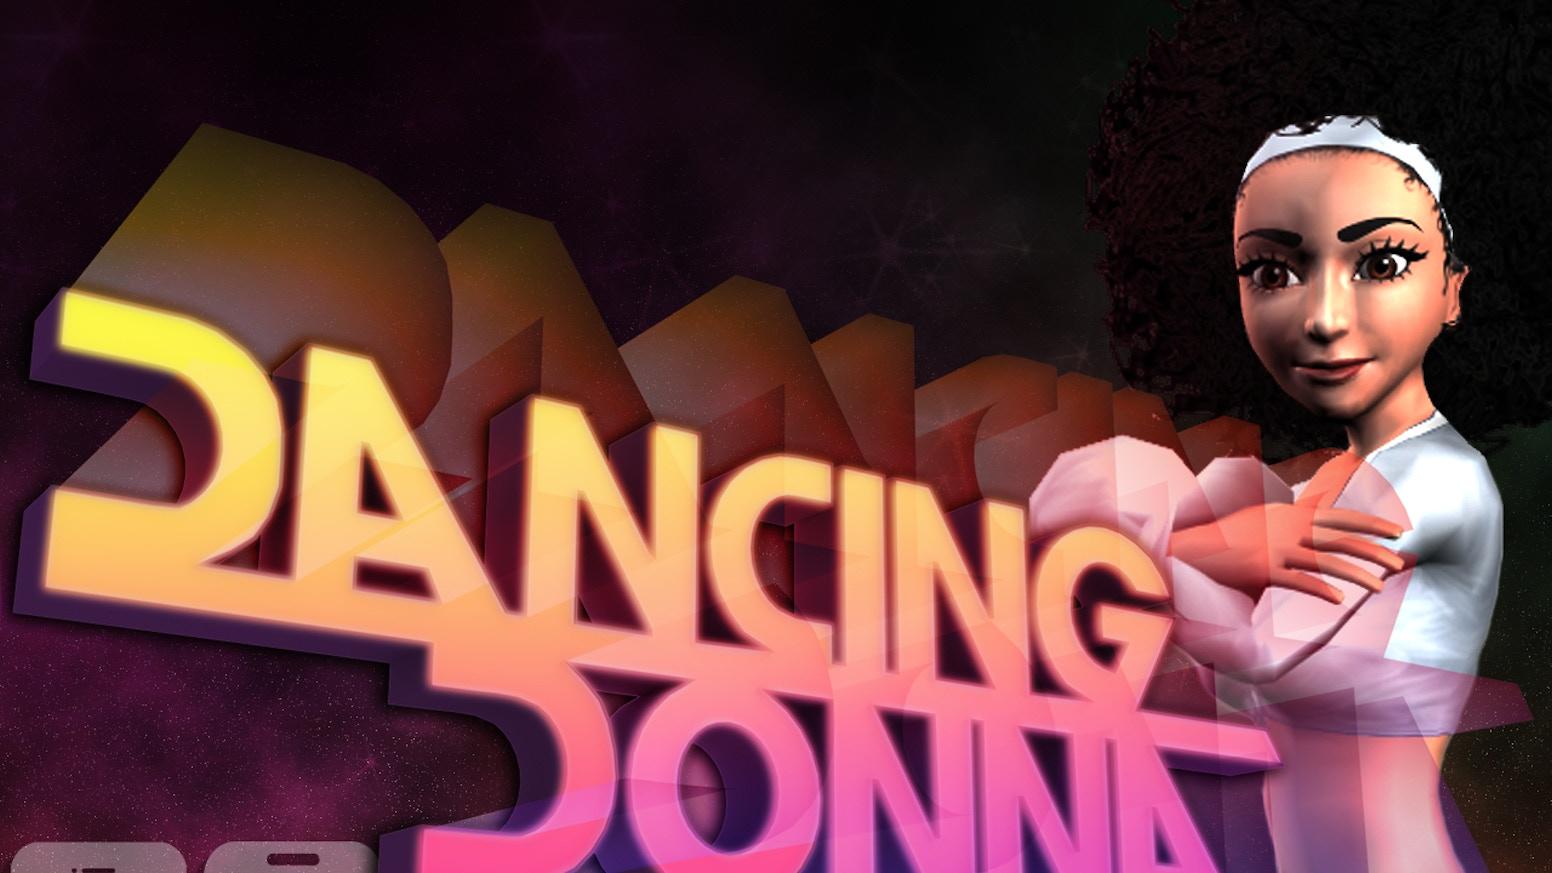 Dancing Donna: Augmented Dance App by Motus Digital